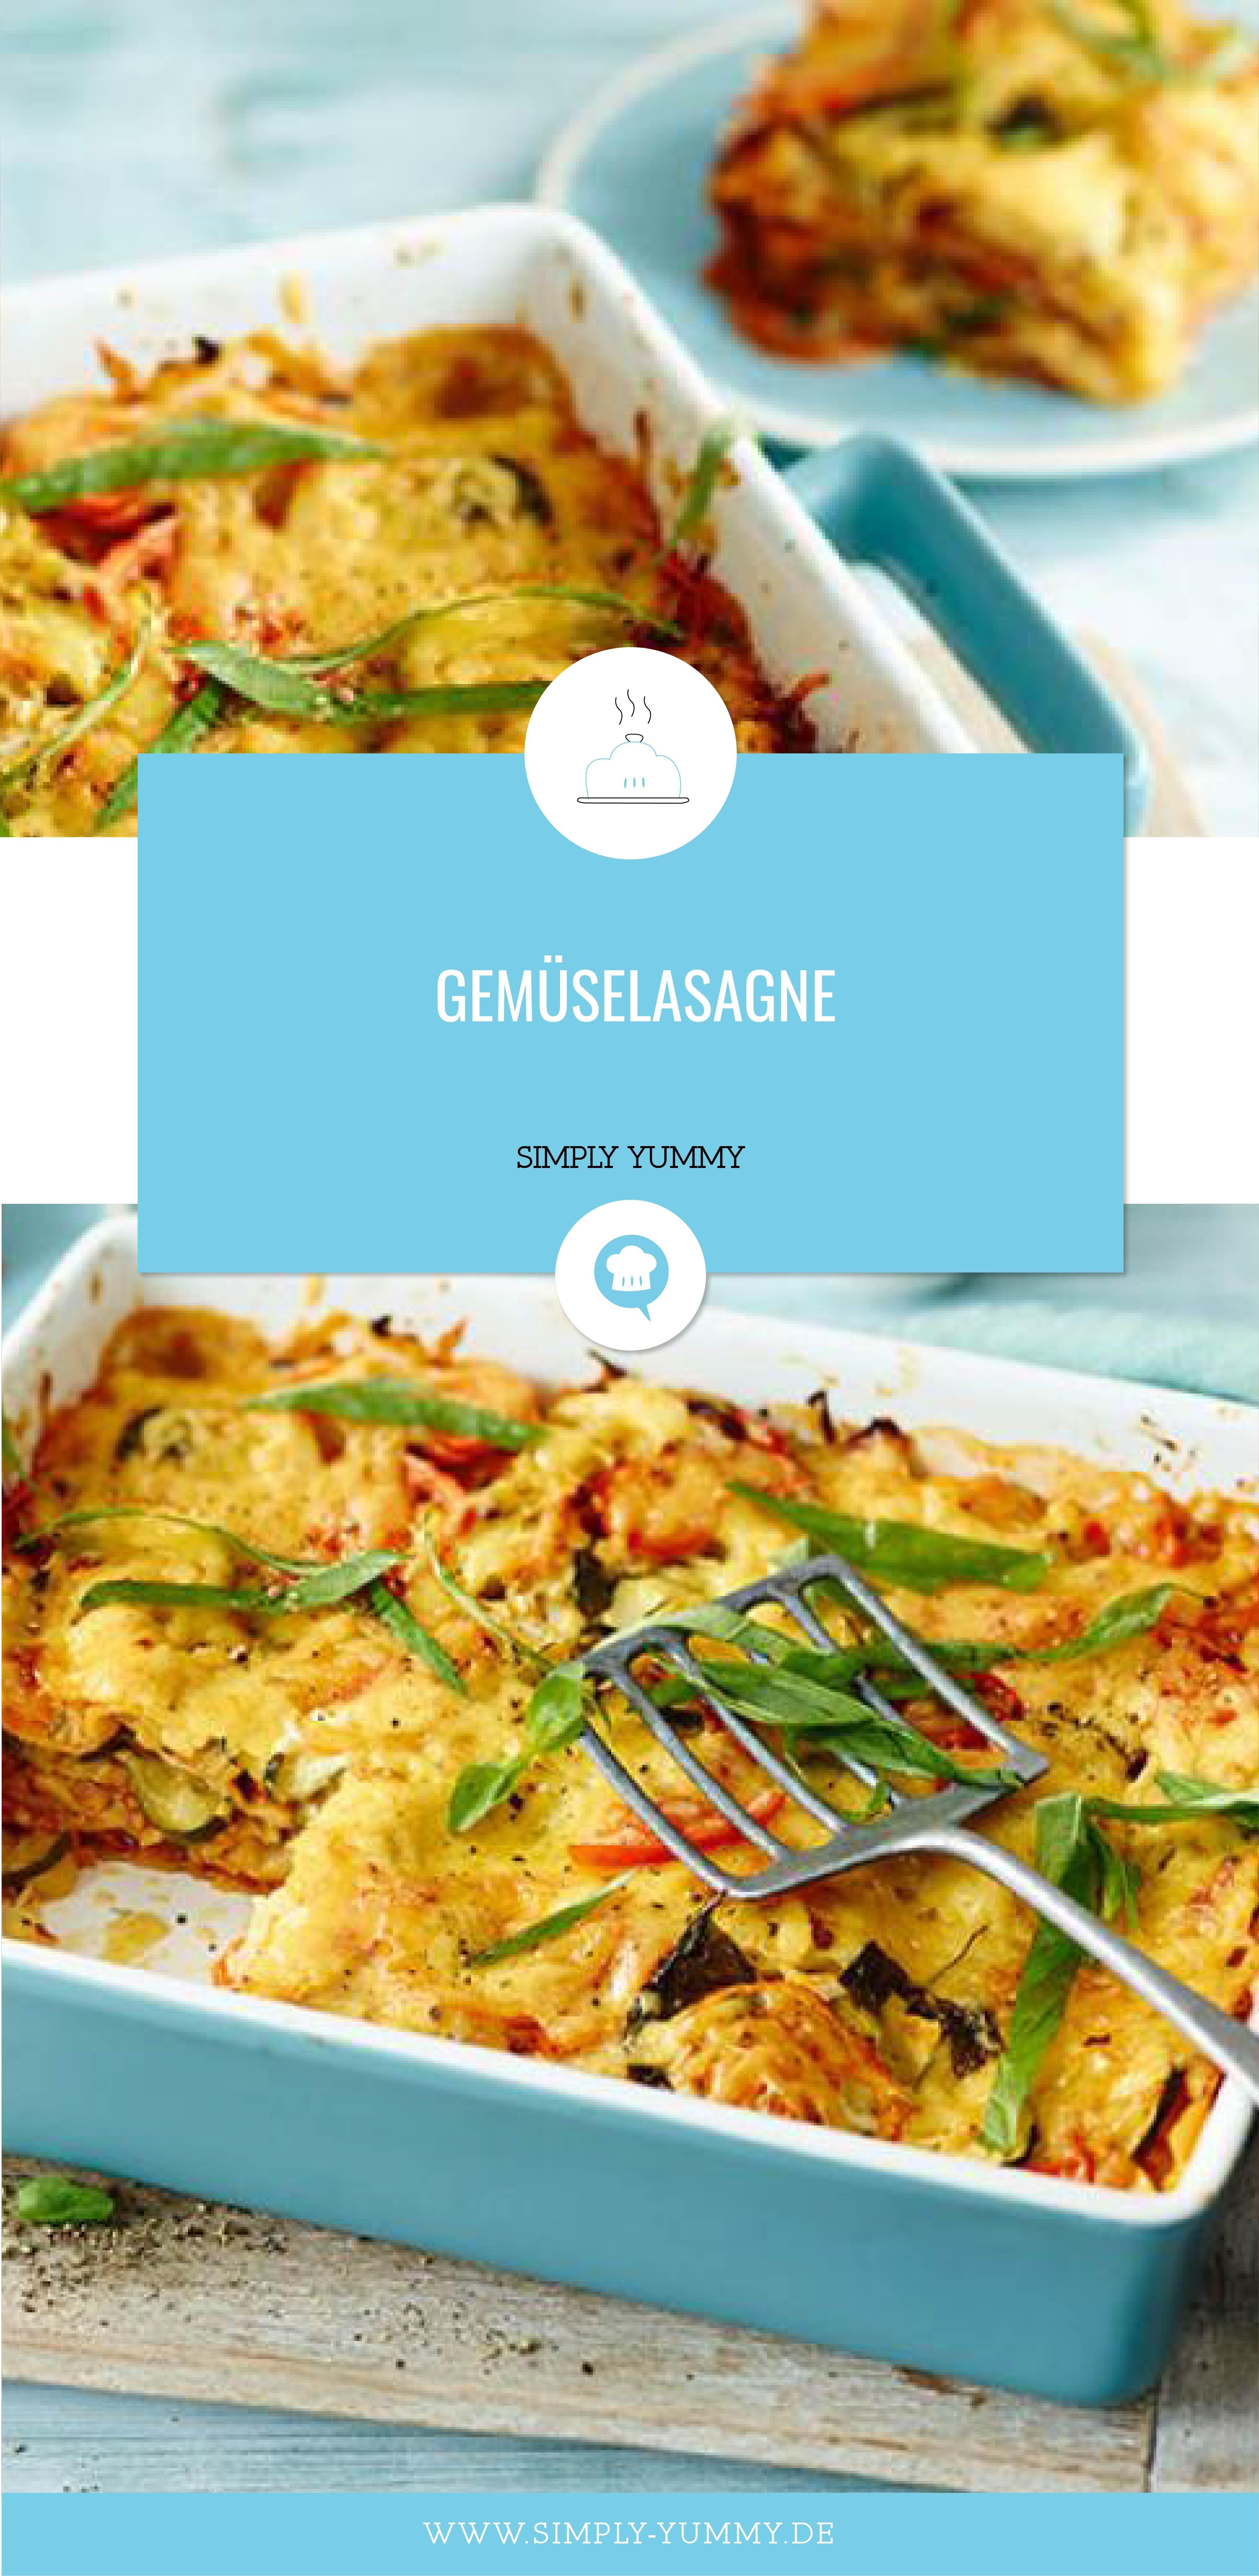 #rezept#rezepte #selbstgemacht #gemselasagne #vegetarisch #alternative #vegetarian #schlemmen #soulf...